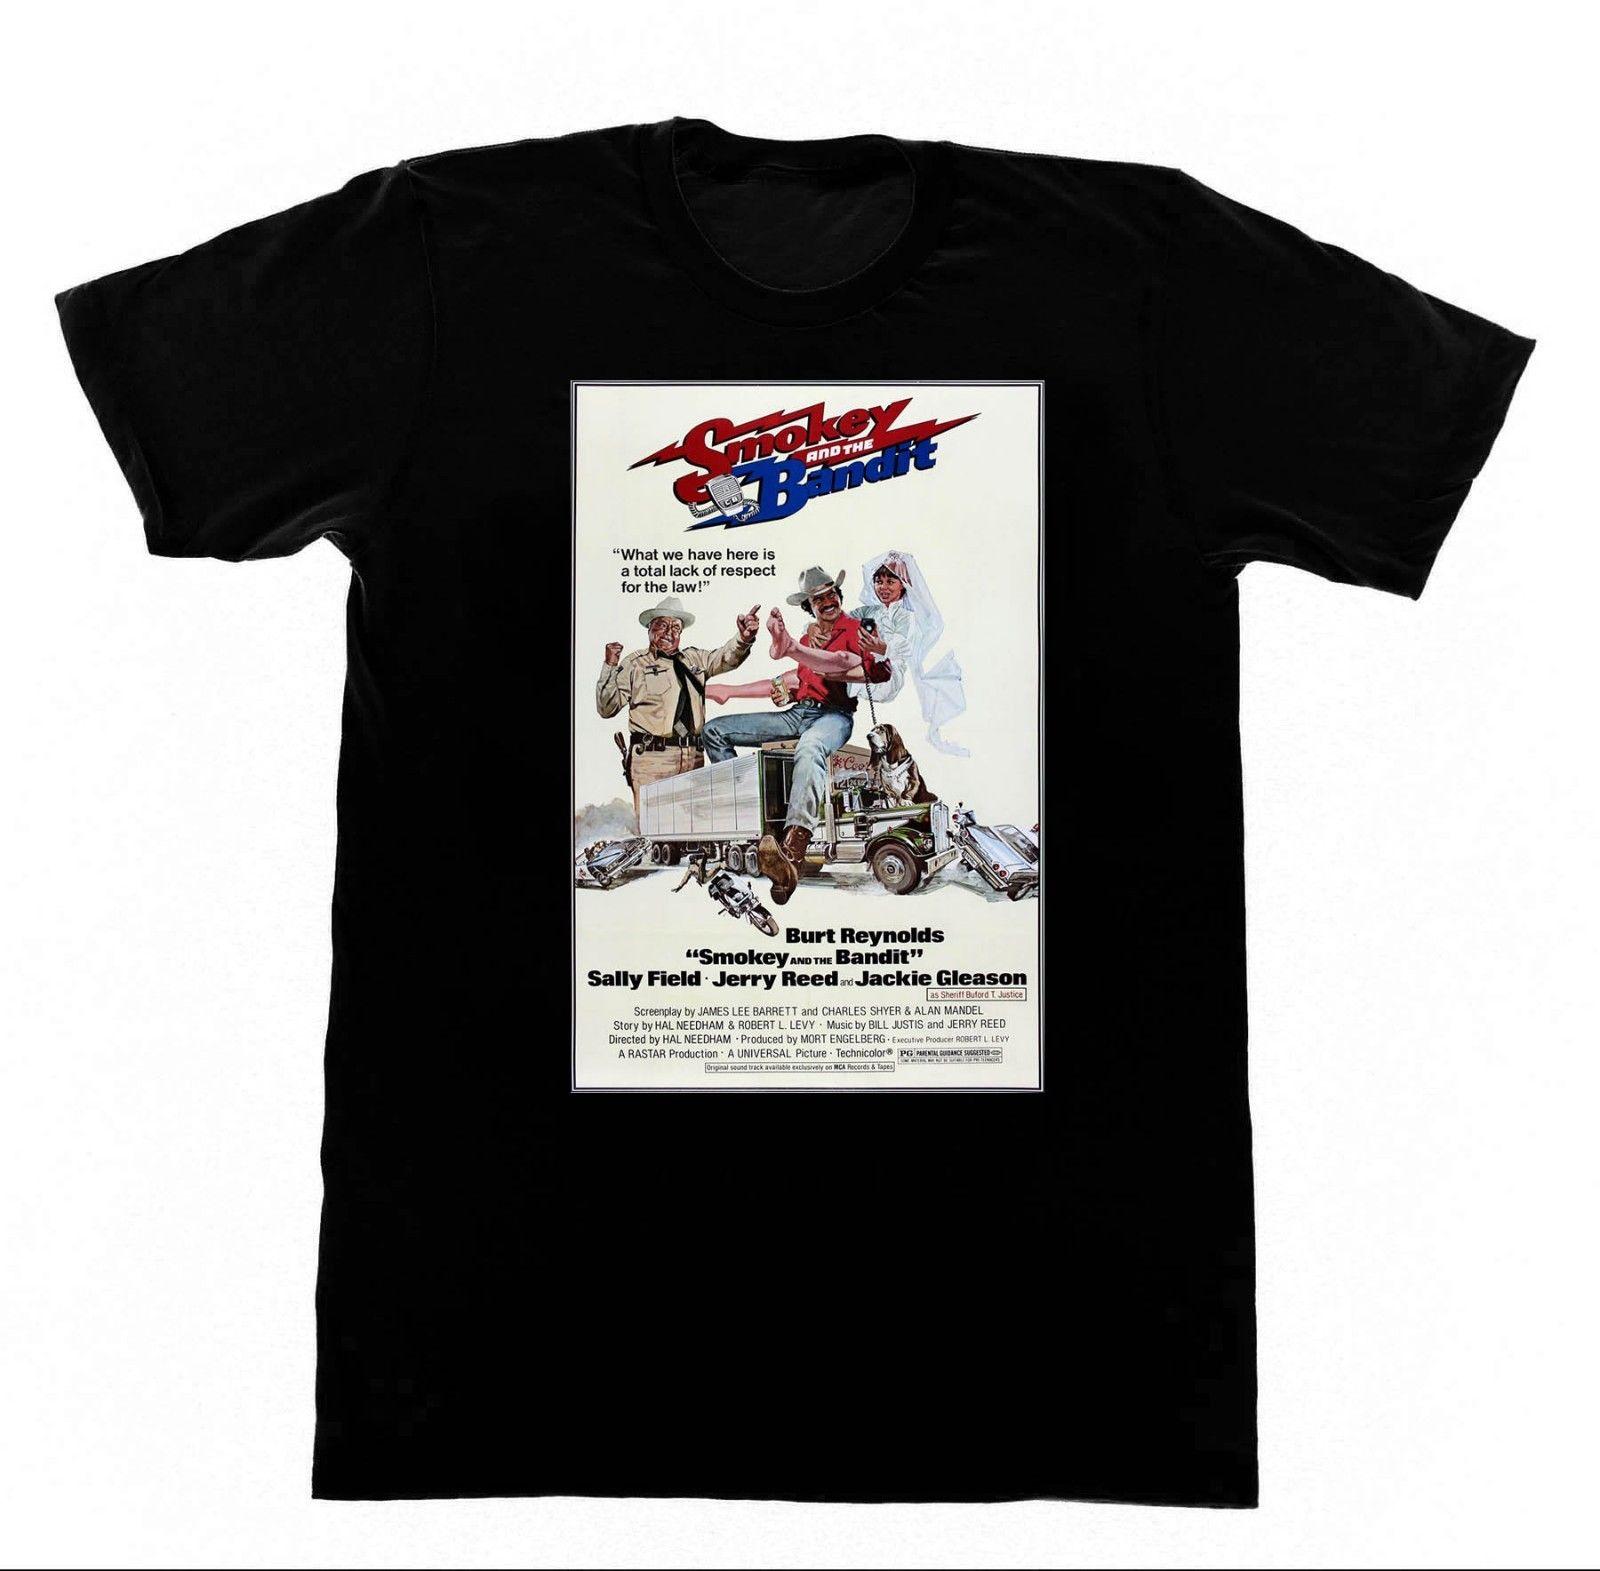 Smokey y el Bandit-Shirt camiseta Trans Am Bert Reynolds Racinger verano manga corta Camiseta de moda envío gratis